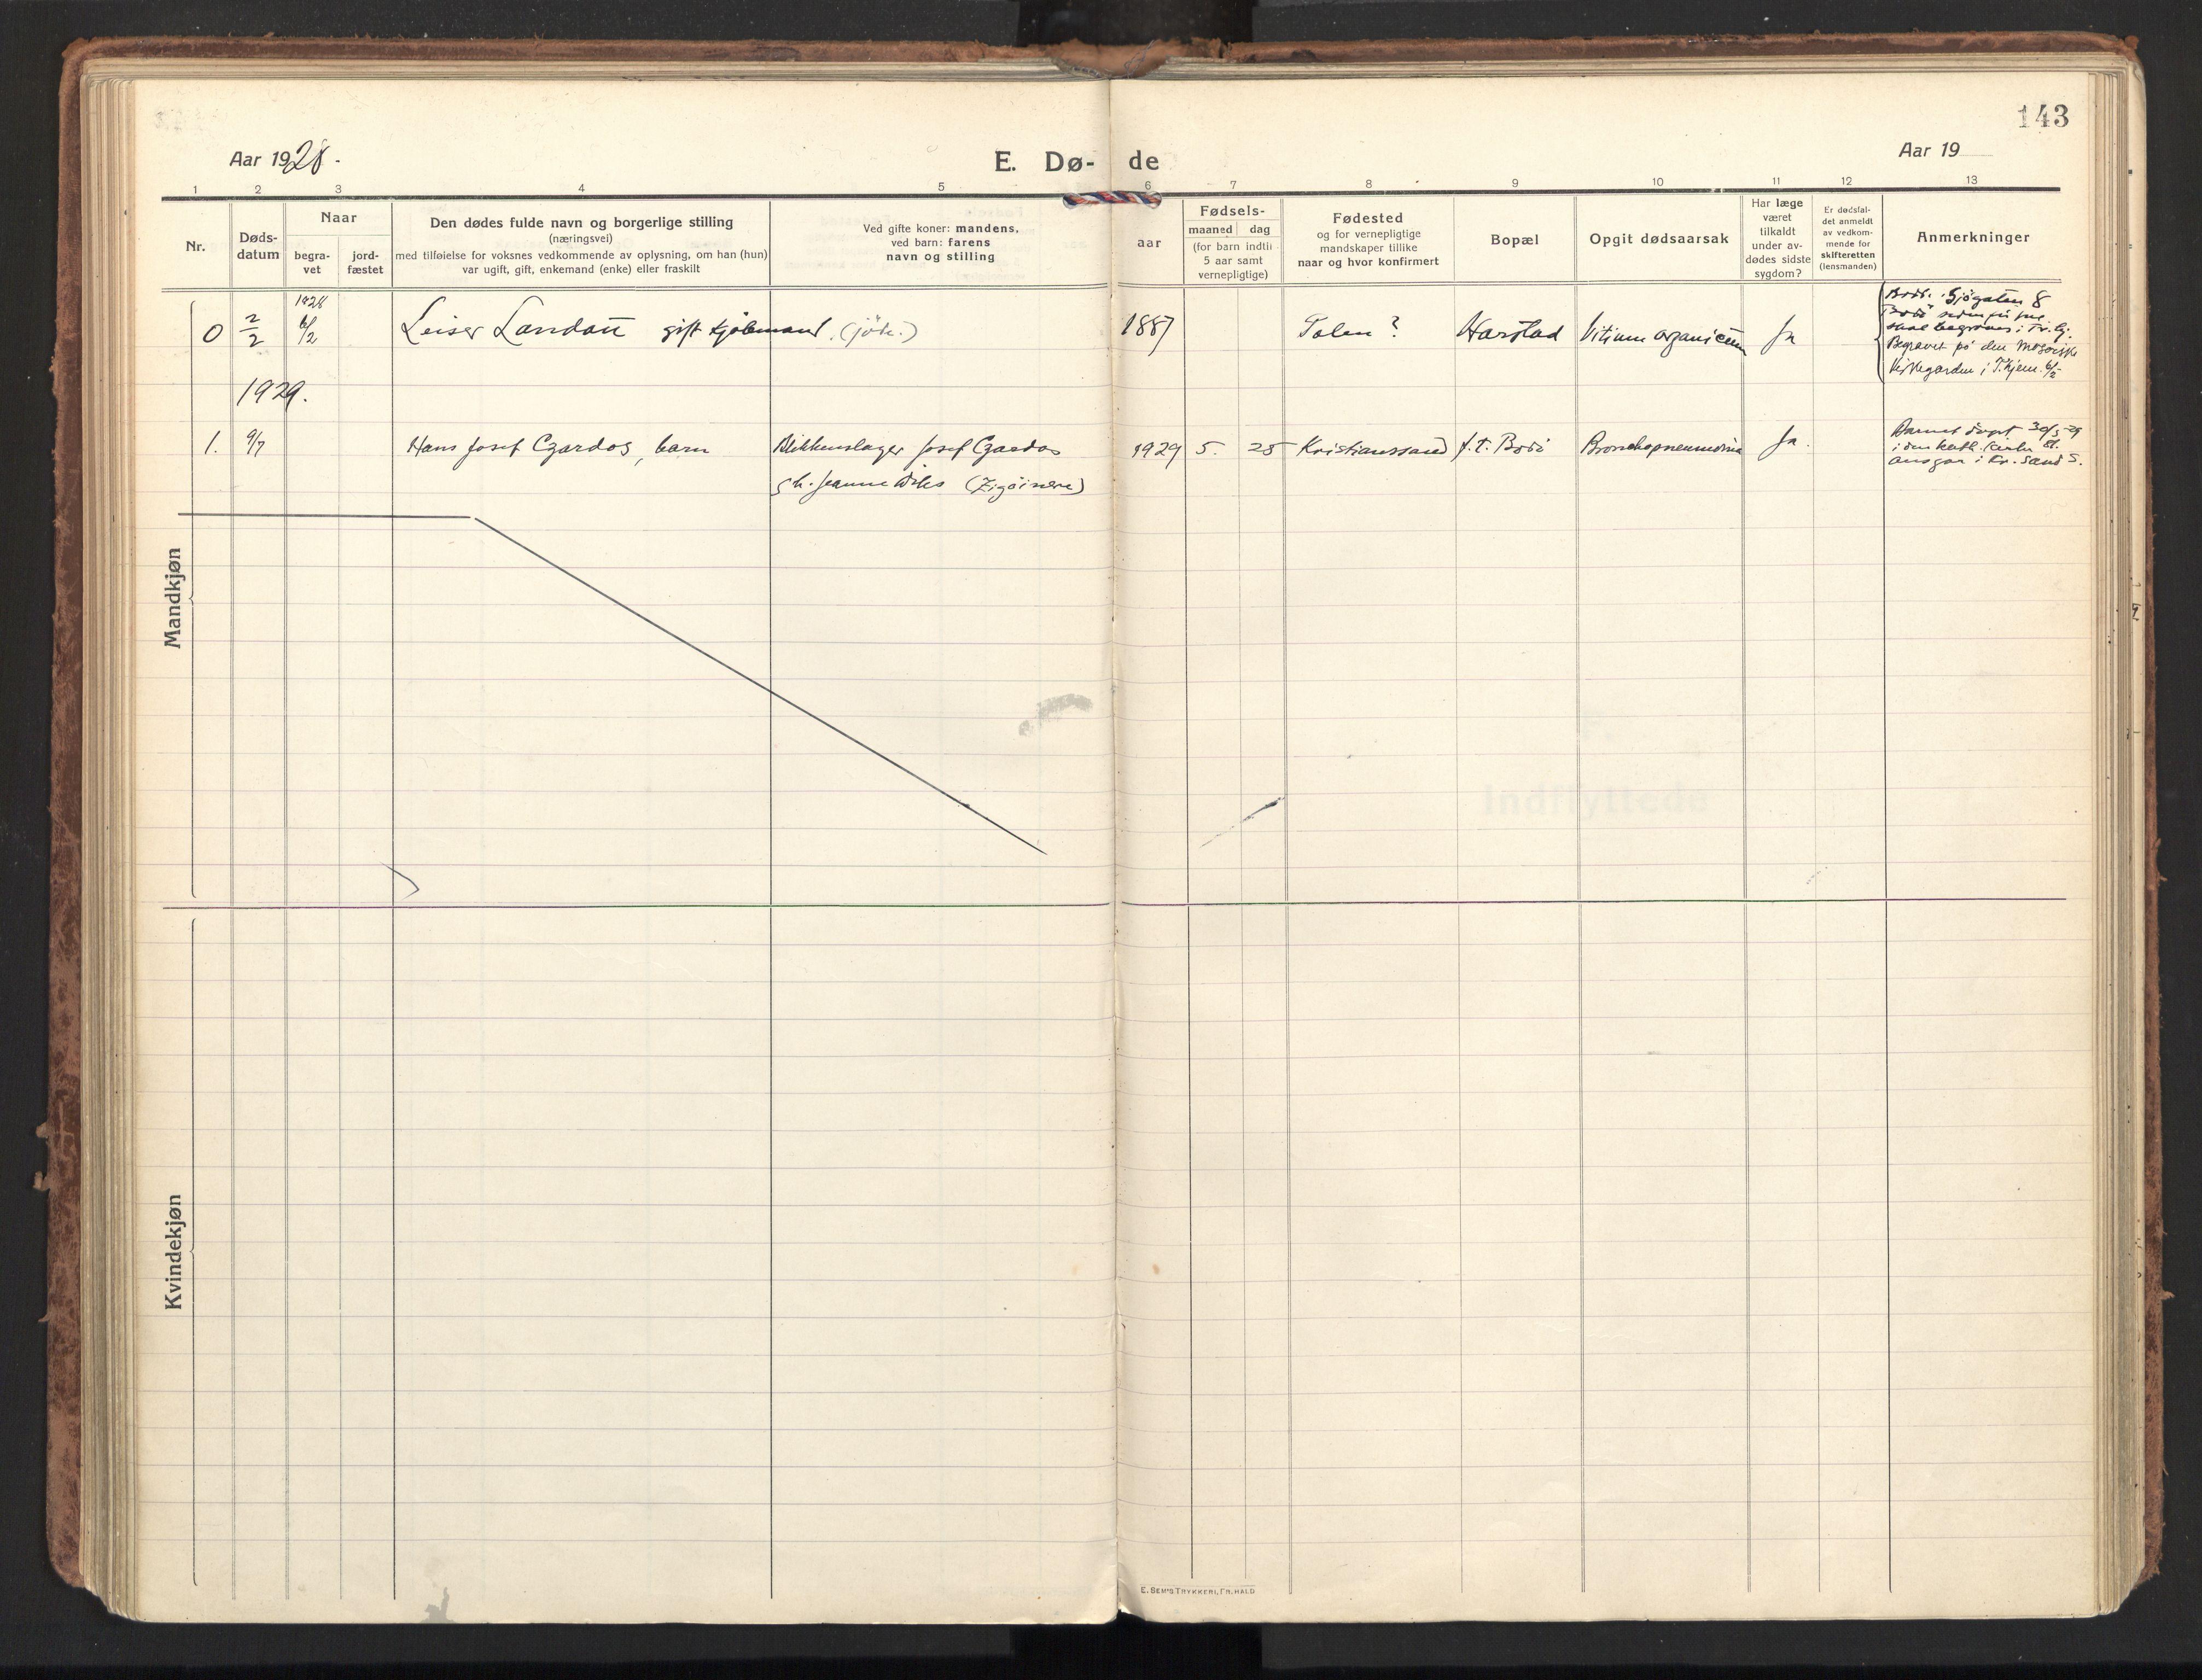 SAT, Ministerialprotokoller, klokkerbøker og fødselsregistre - Nordland, 801/L0018: Ministerialbok nr. 801A18, 1916-1930, s. 143